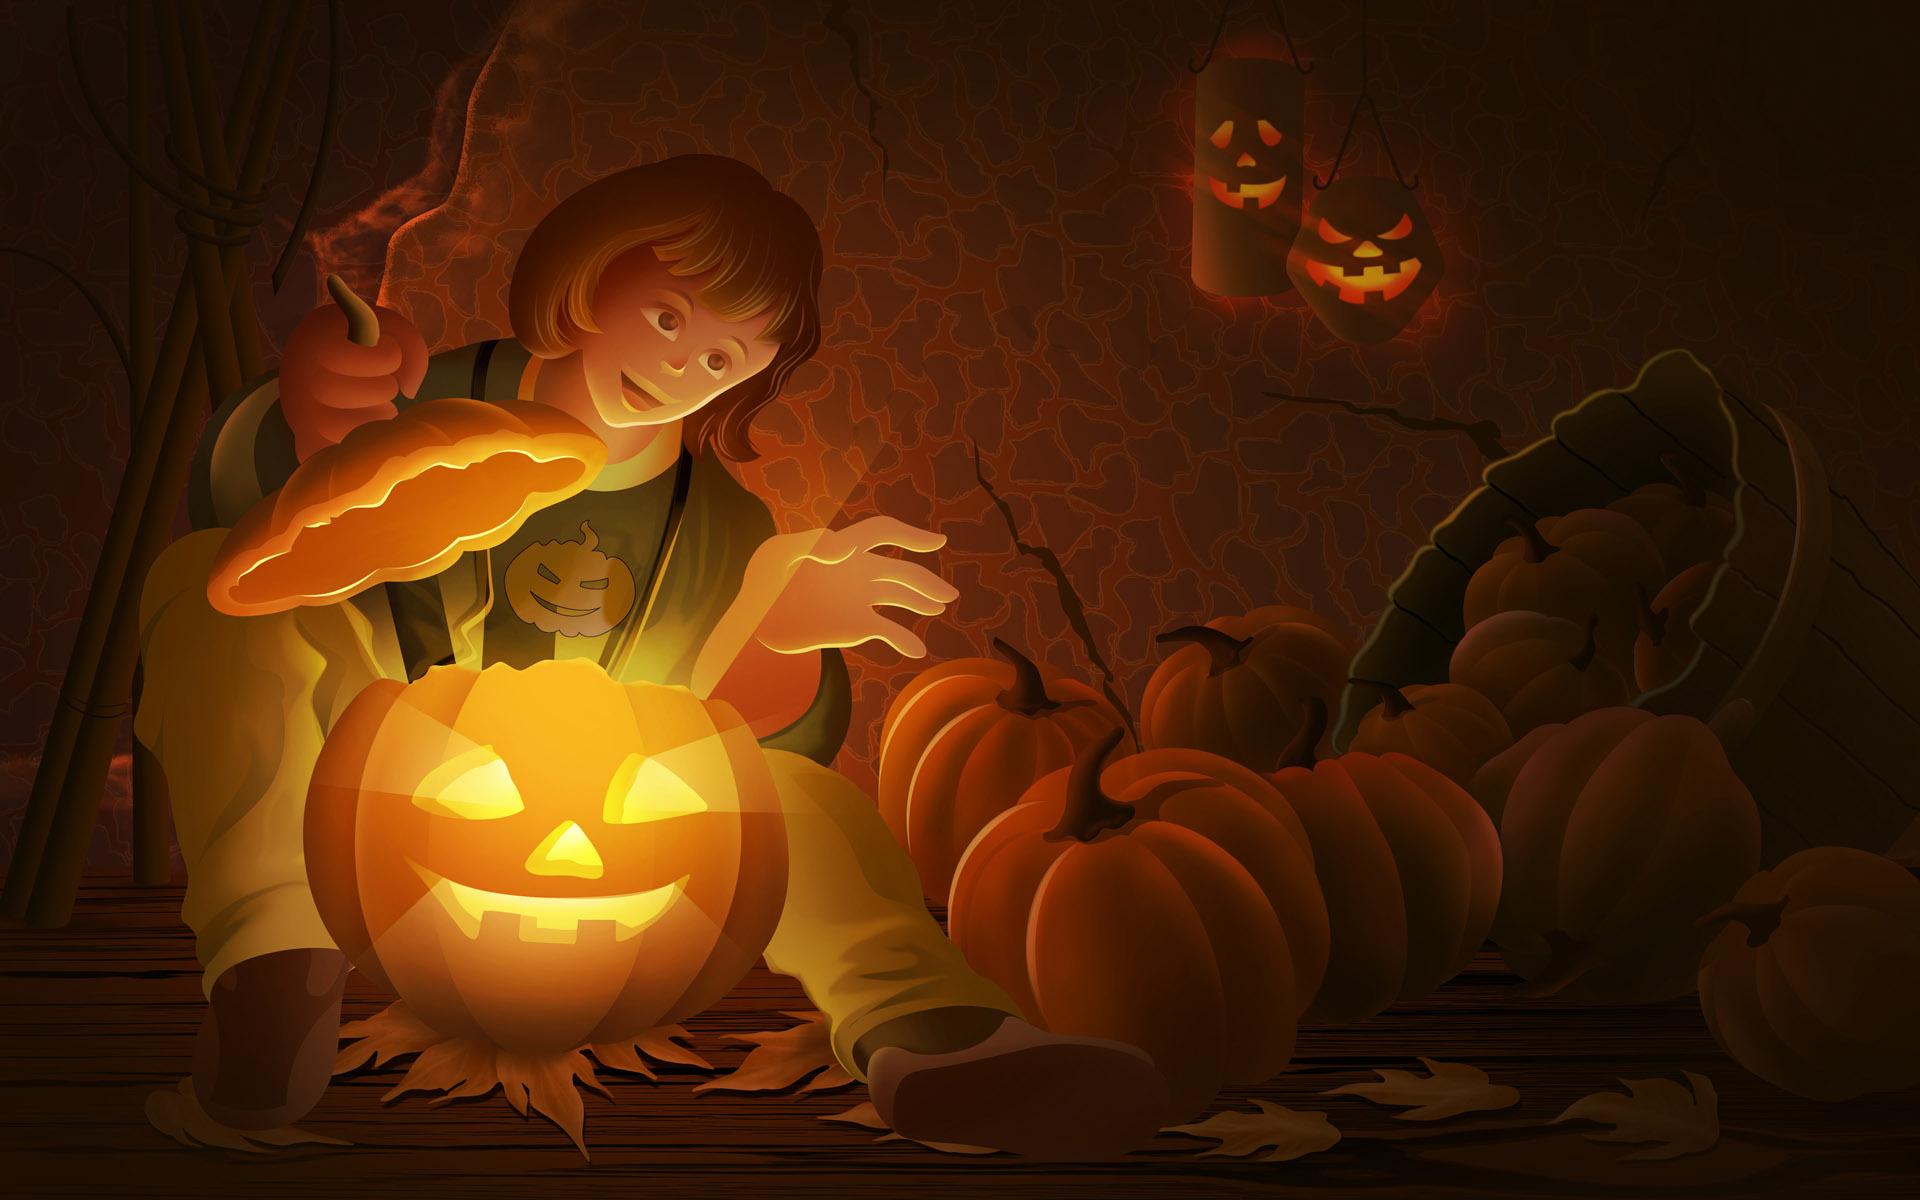 halloween wallpaper wallpapers christmas scariest 1920x1200